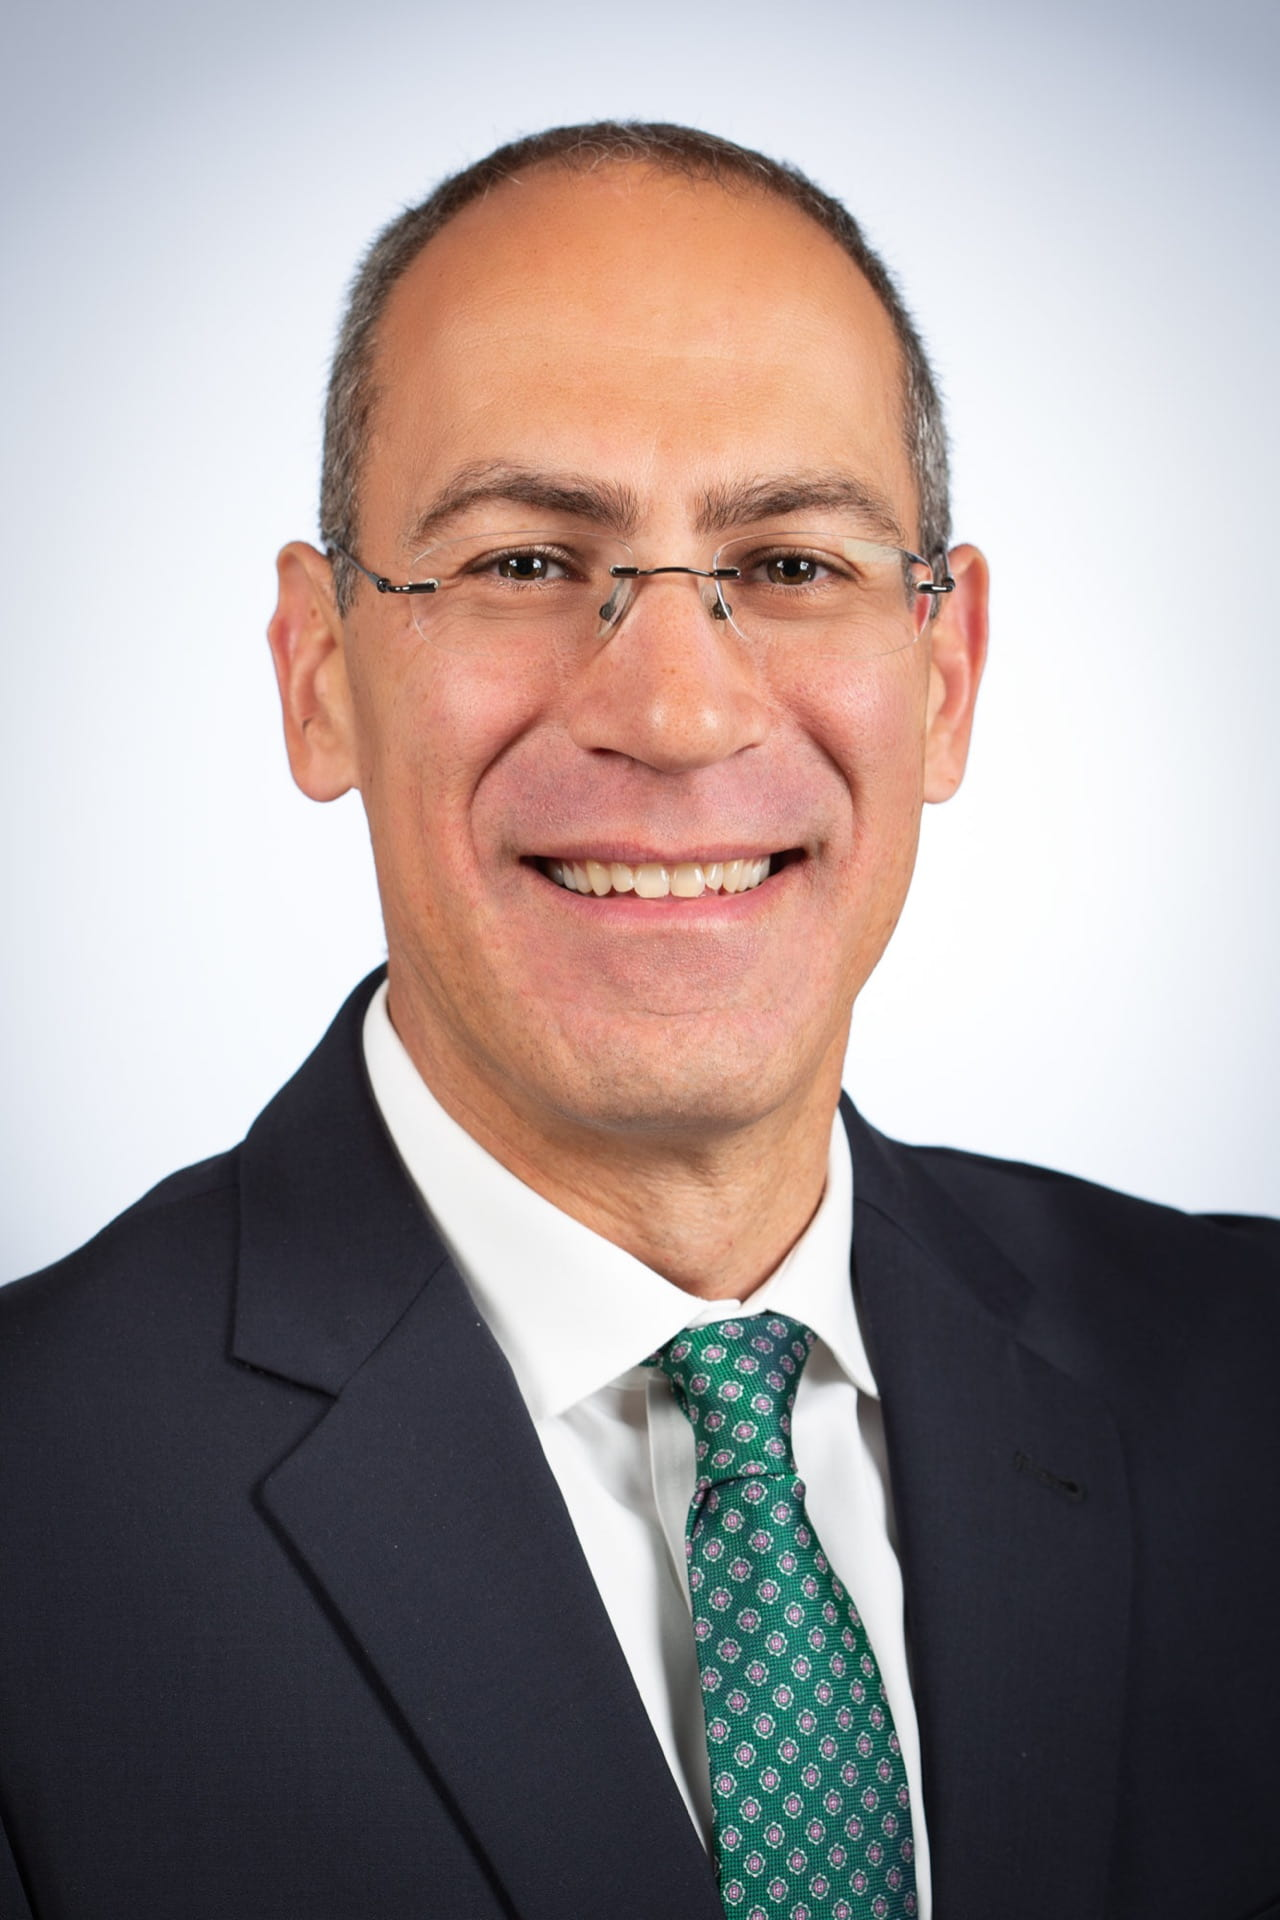 Photo of Michael Alexander, UW-Green Bay Chancellor